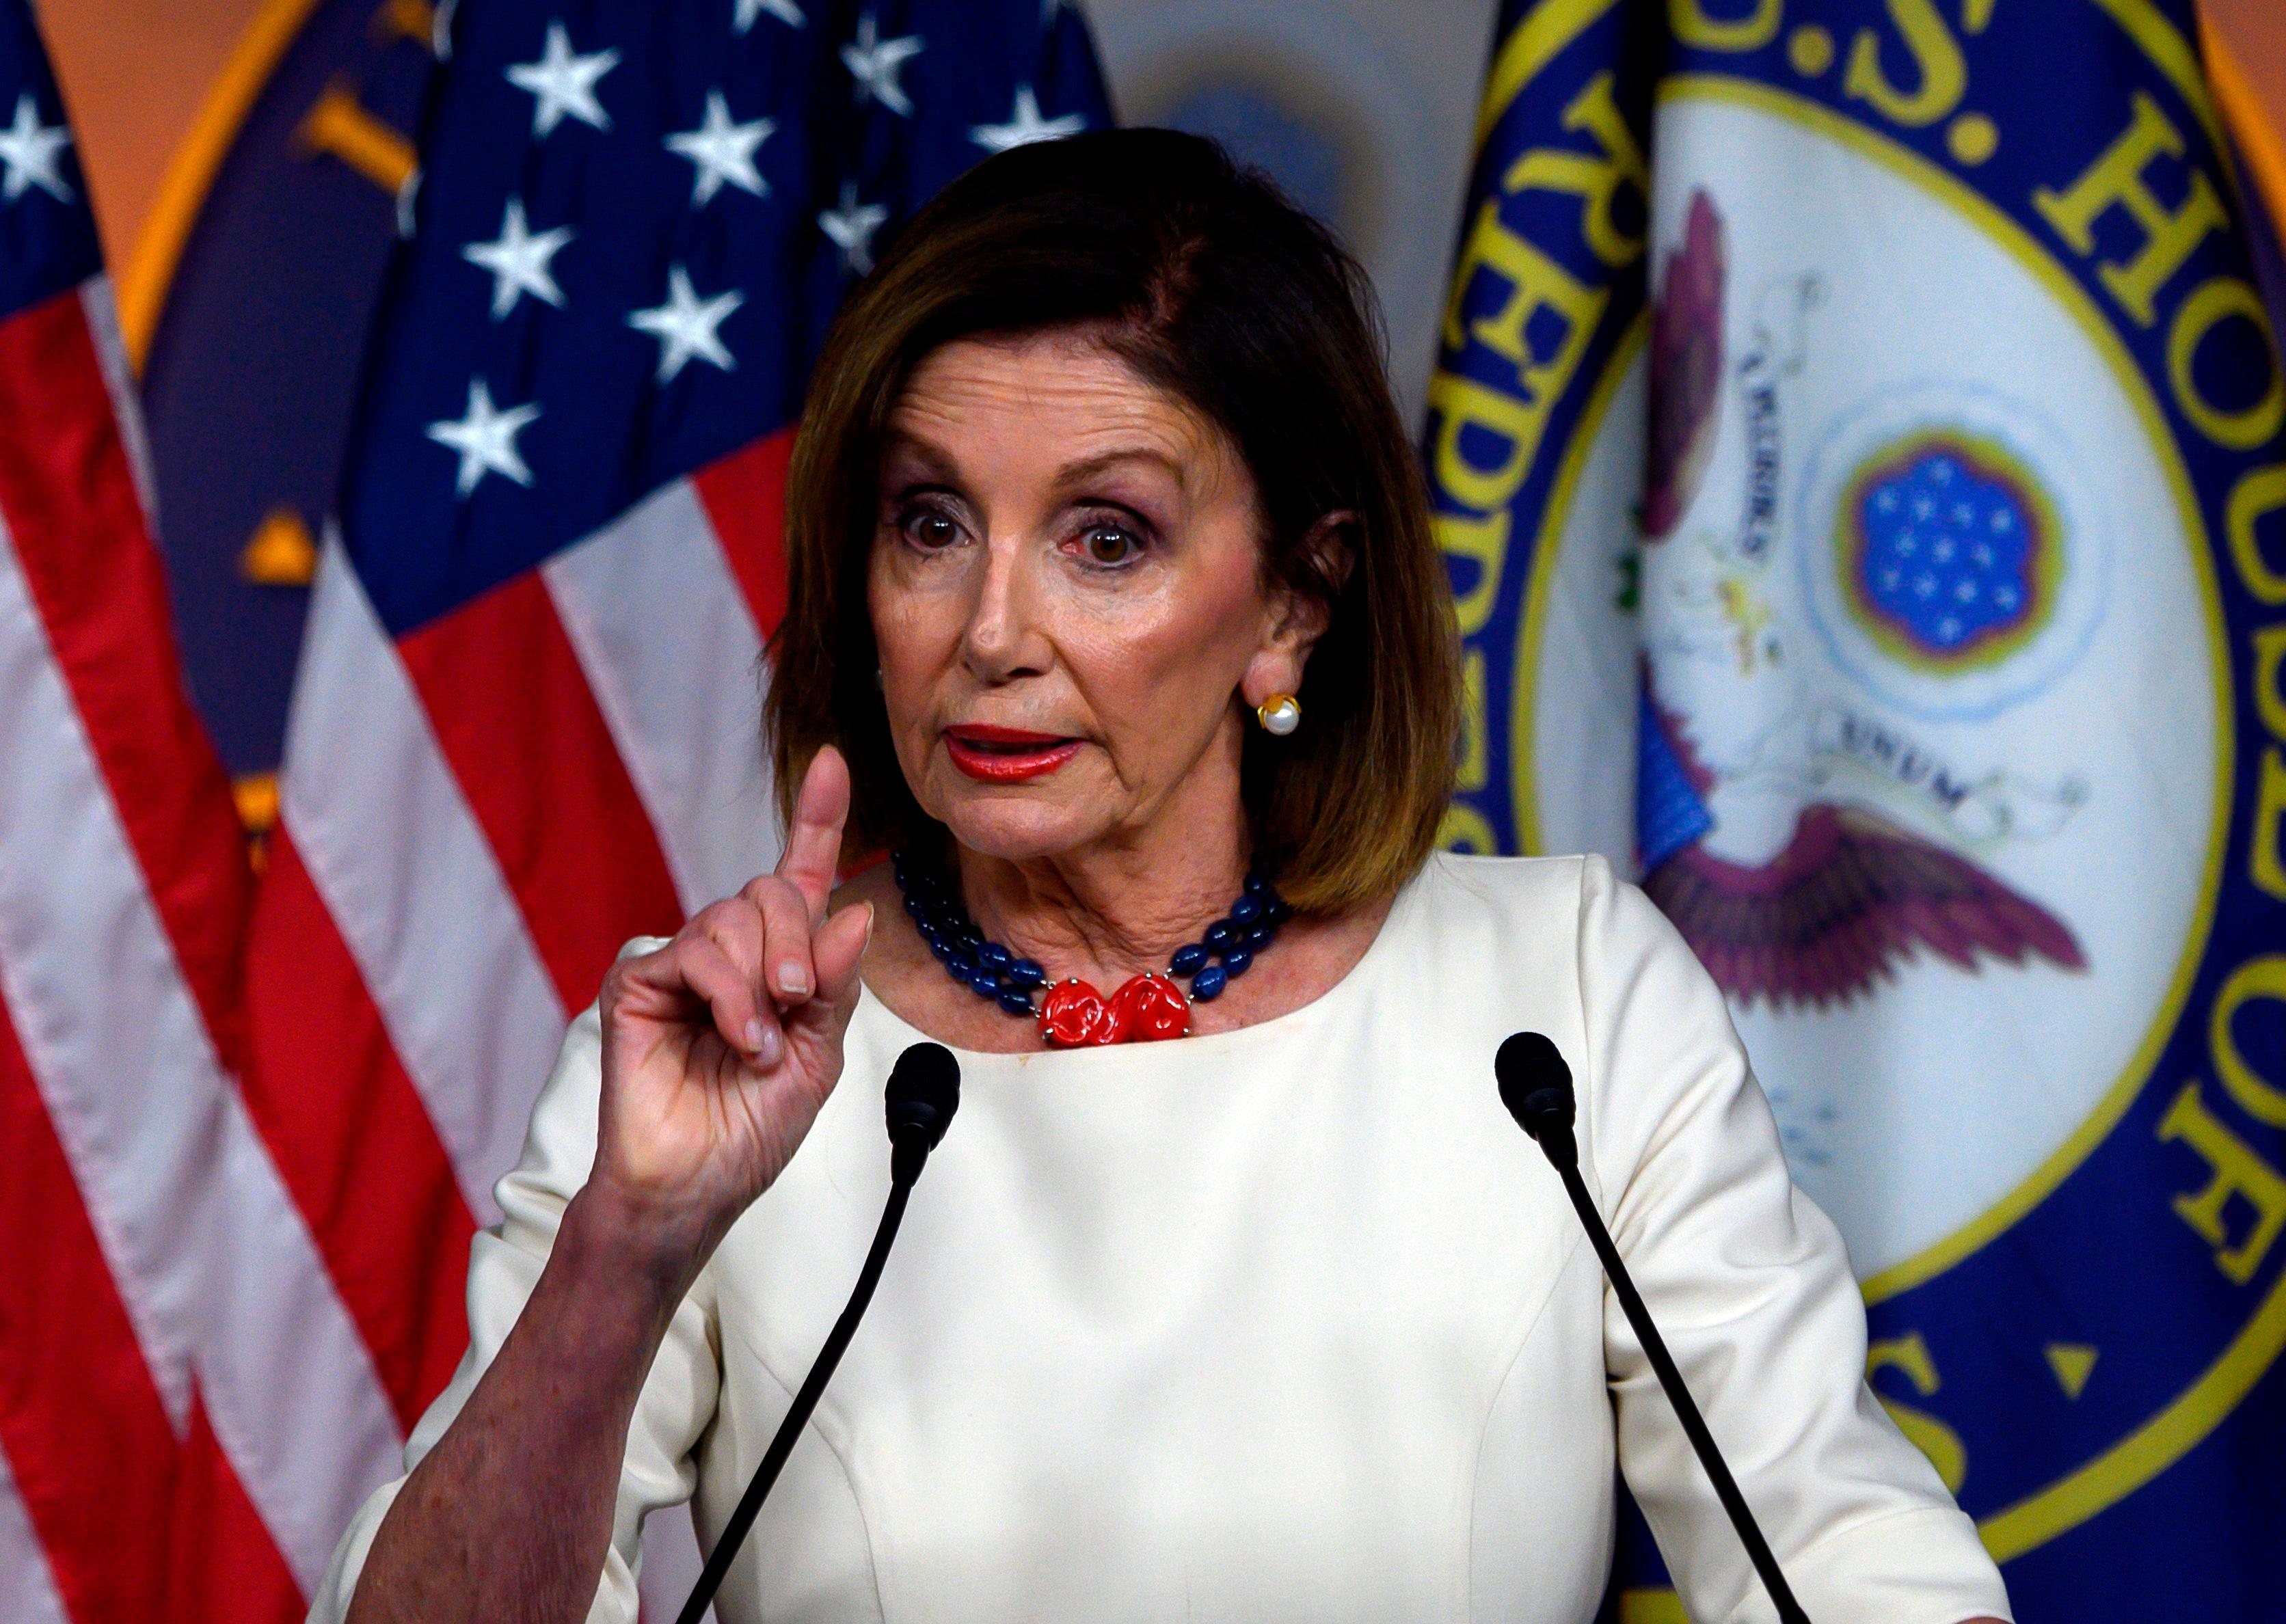 Democrats threaten to subpoena White House for documents in impeachment inquiry